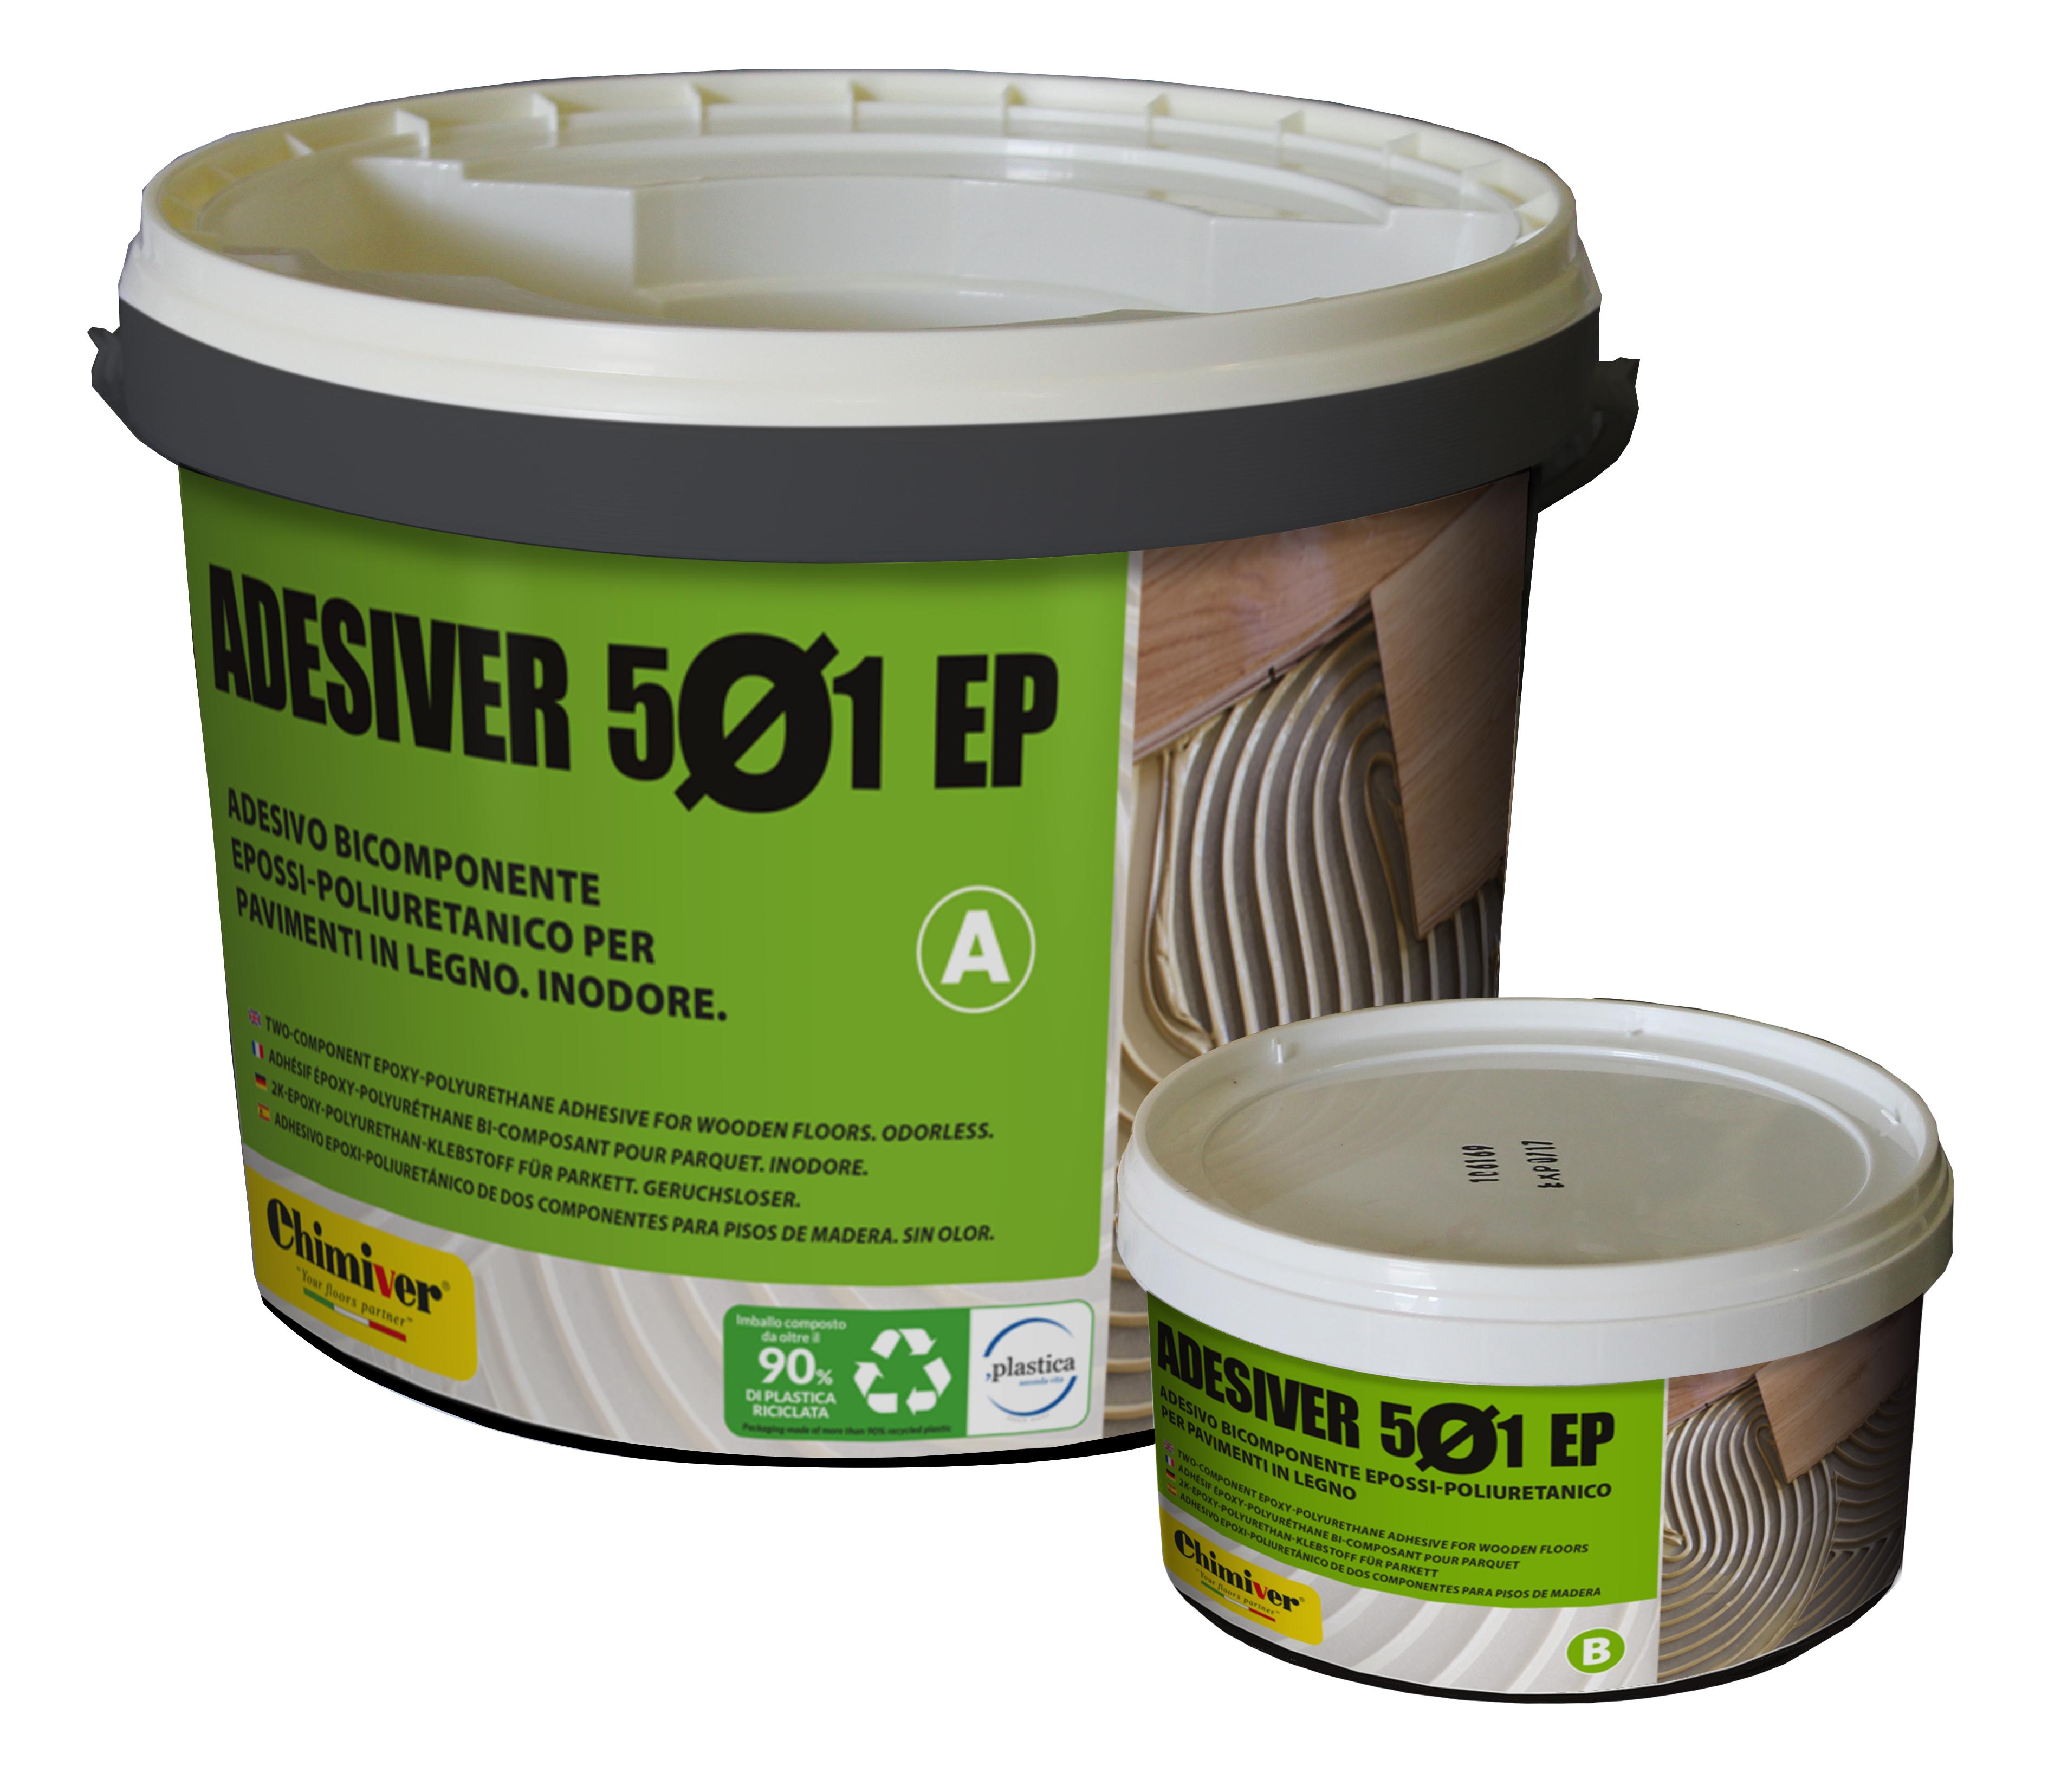 Adesiver_501 EP